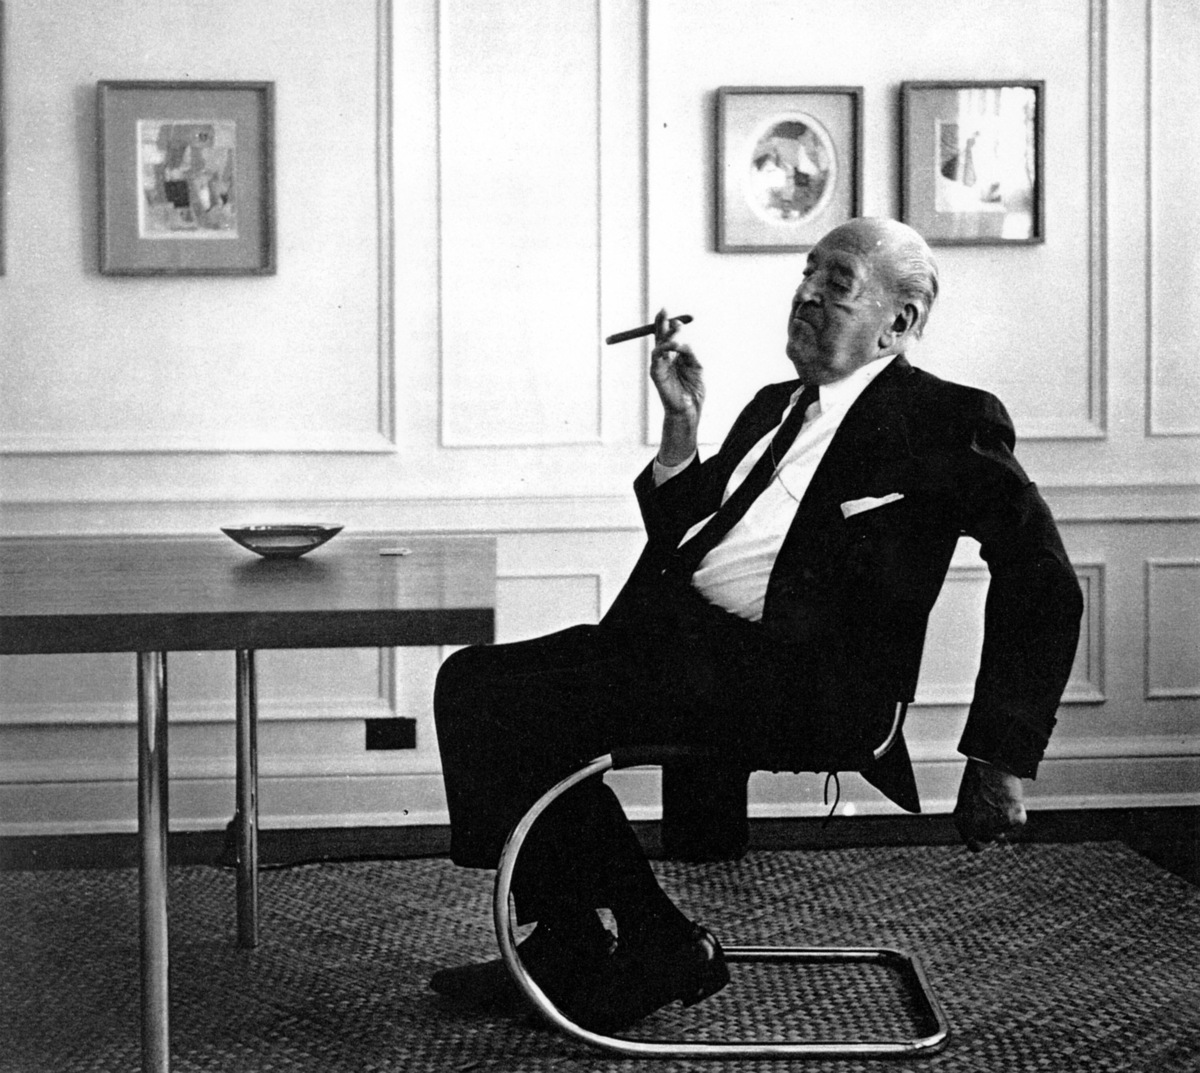 Mies van der Rohe, or should we say, Maria? Image: public domain